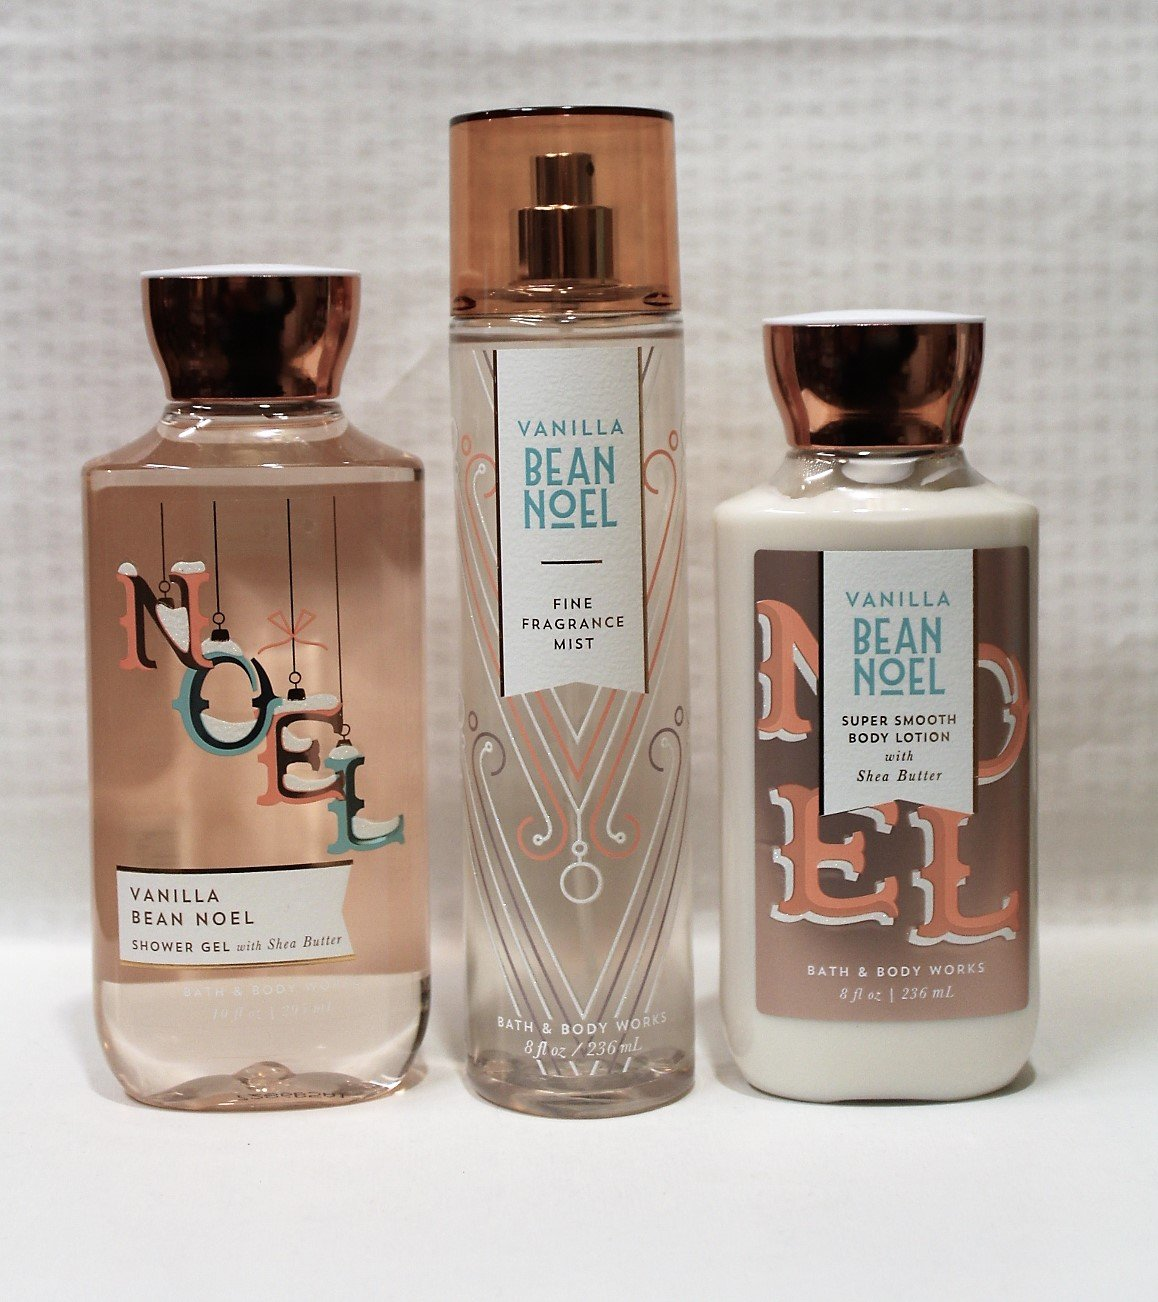 Bath & Body Works ~ Signature Collection ~ Winter 2017 ~ Vanilla Bean Noel ~ Shower Gel - Fine Fragrance Mist & Body Lotion – Trio Gift Set